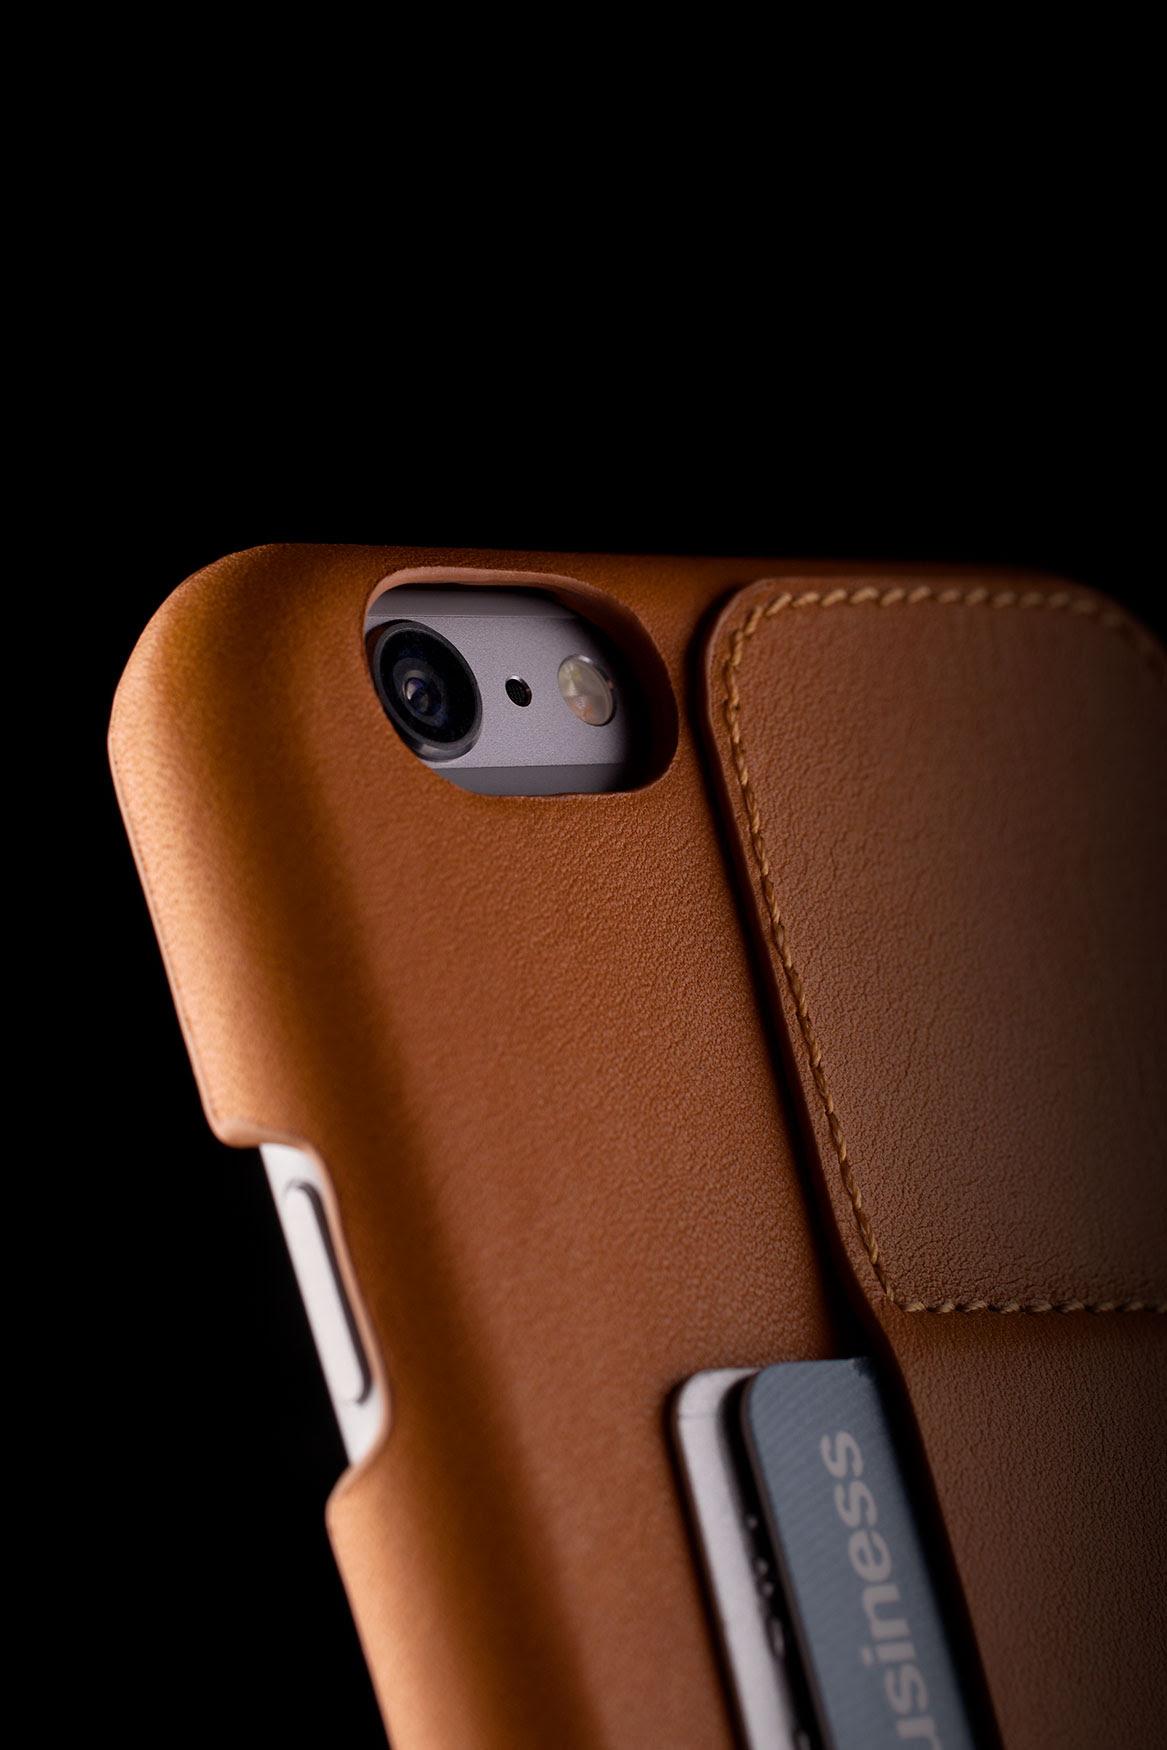 carcasa inteligente iphone 6